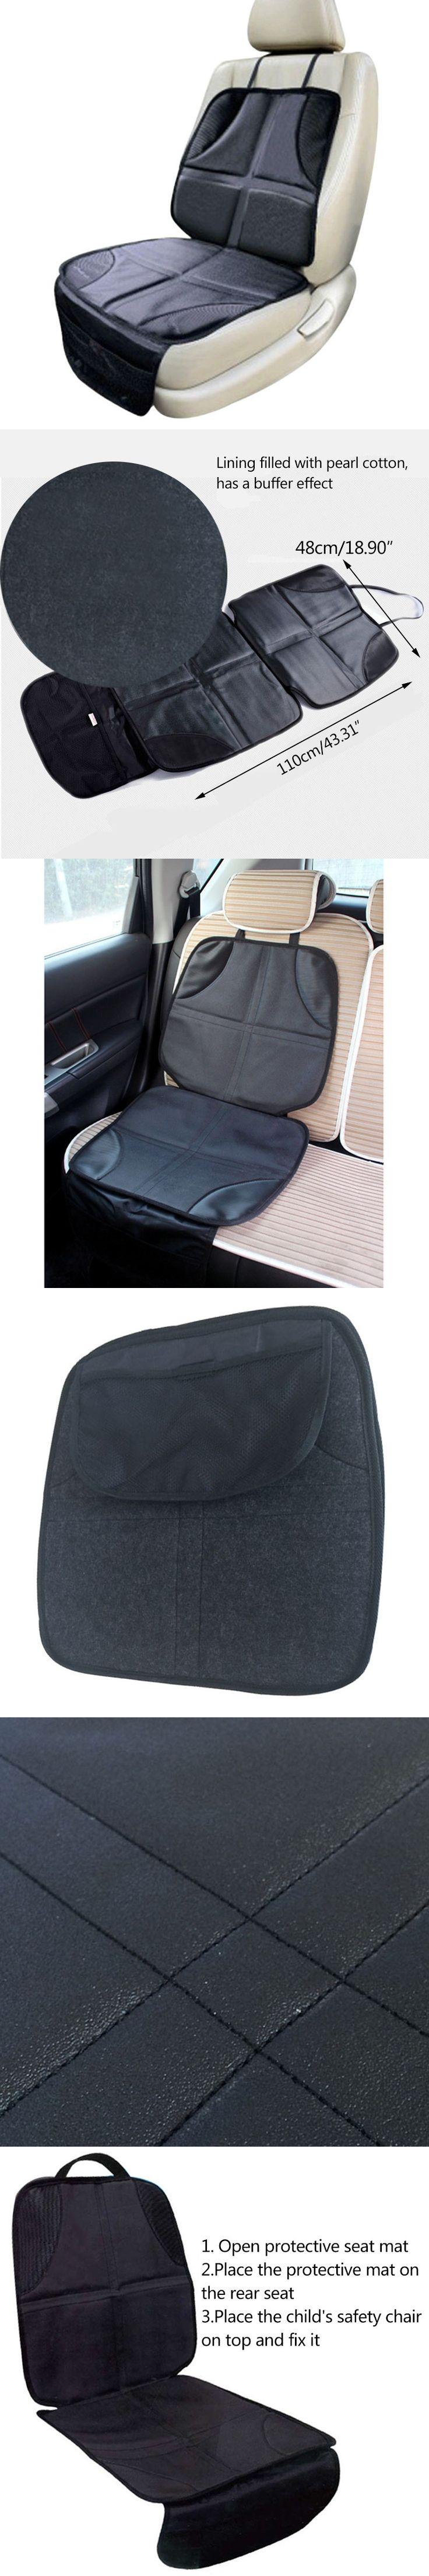 110*48 cm Baby Car Seat Mat Non-Slip Child Car Safety Seats Waterproof Cushion Newborn Car Seat Mat with Storage Bag